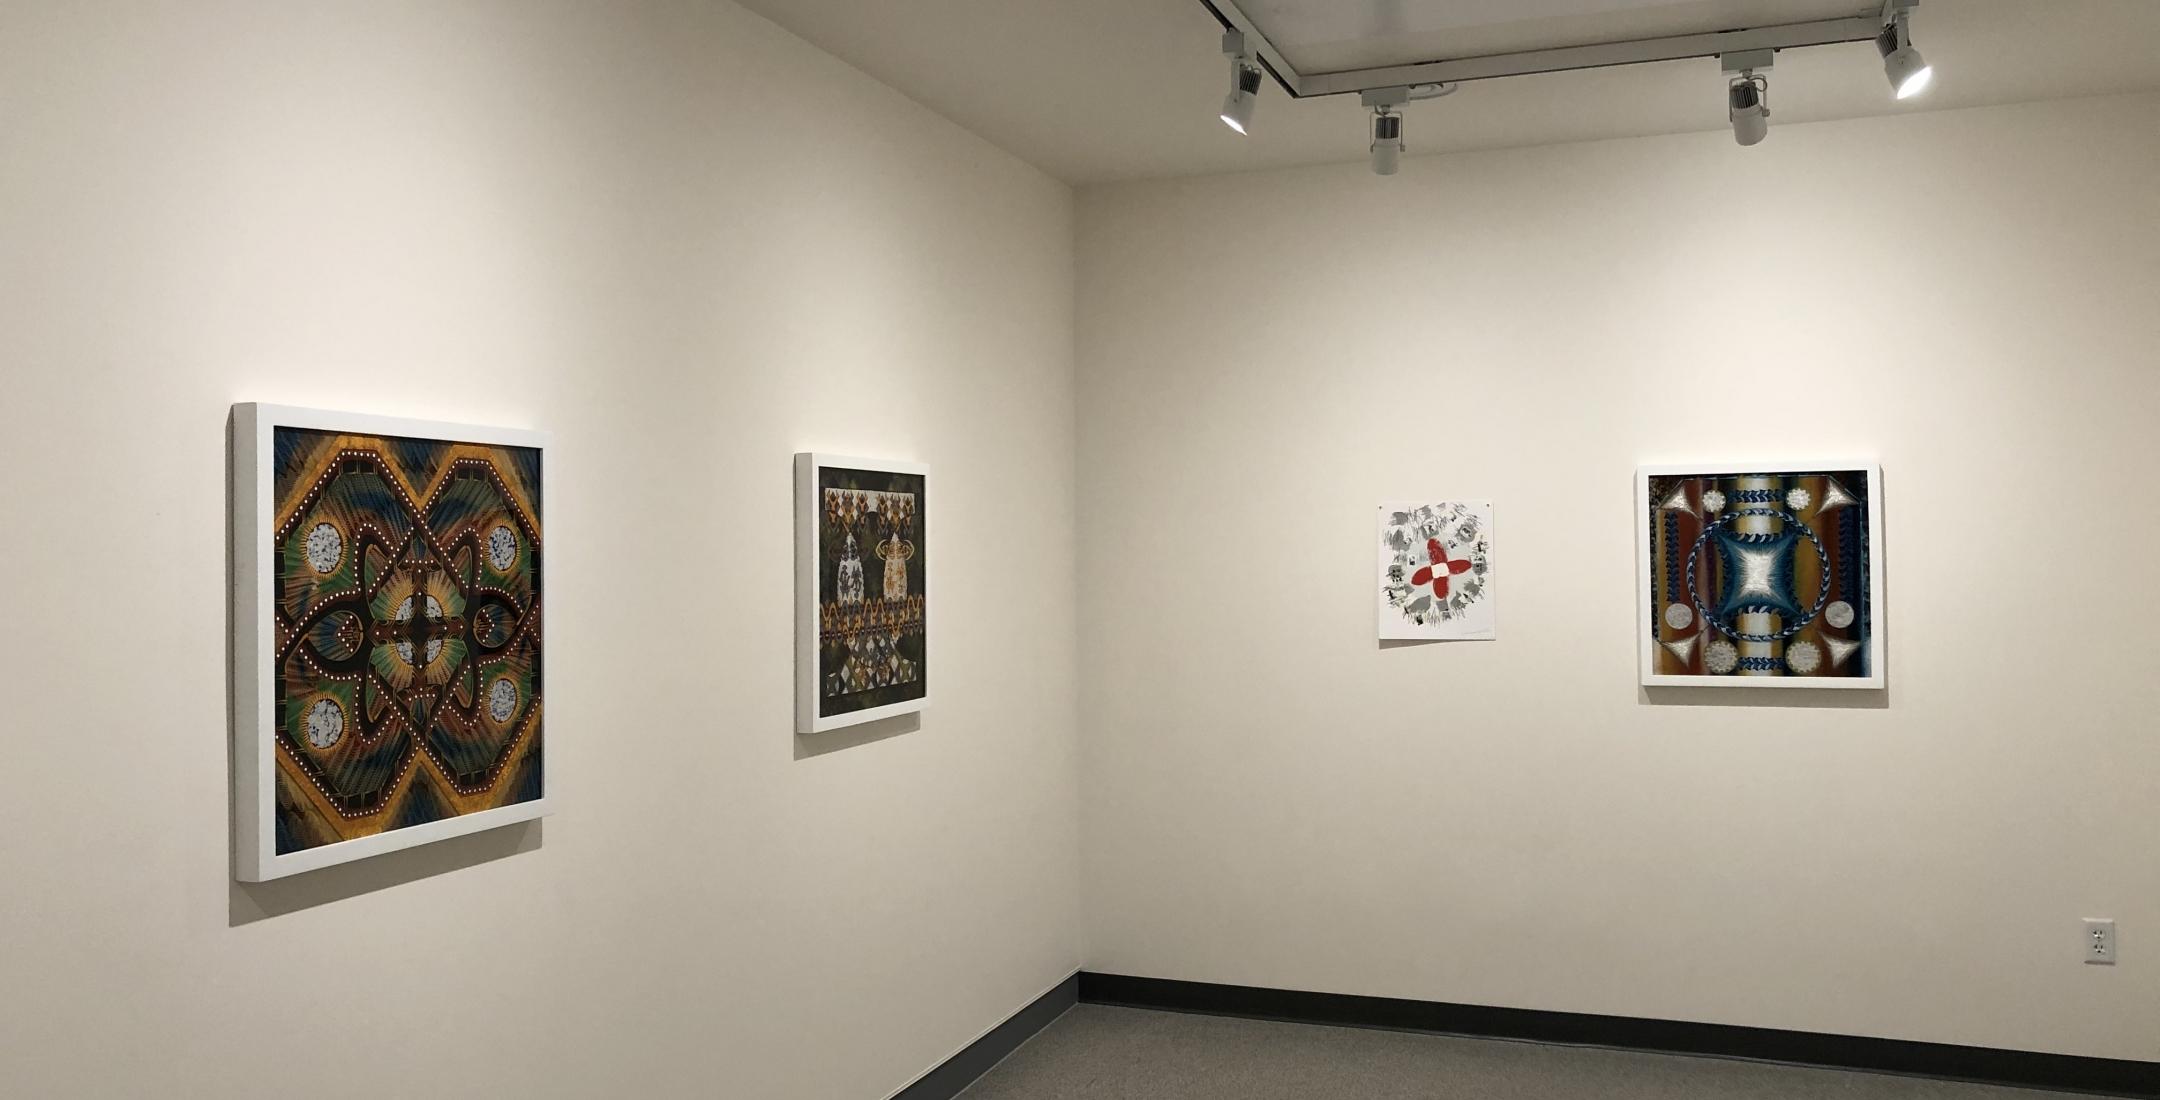 A Warm Reset v.1 - installation view (Tara Austin, James Brinsfield)